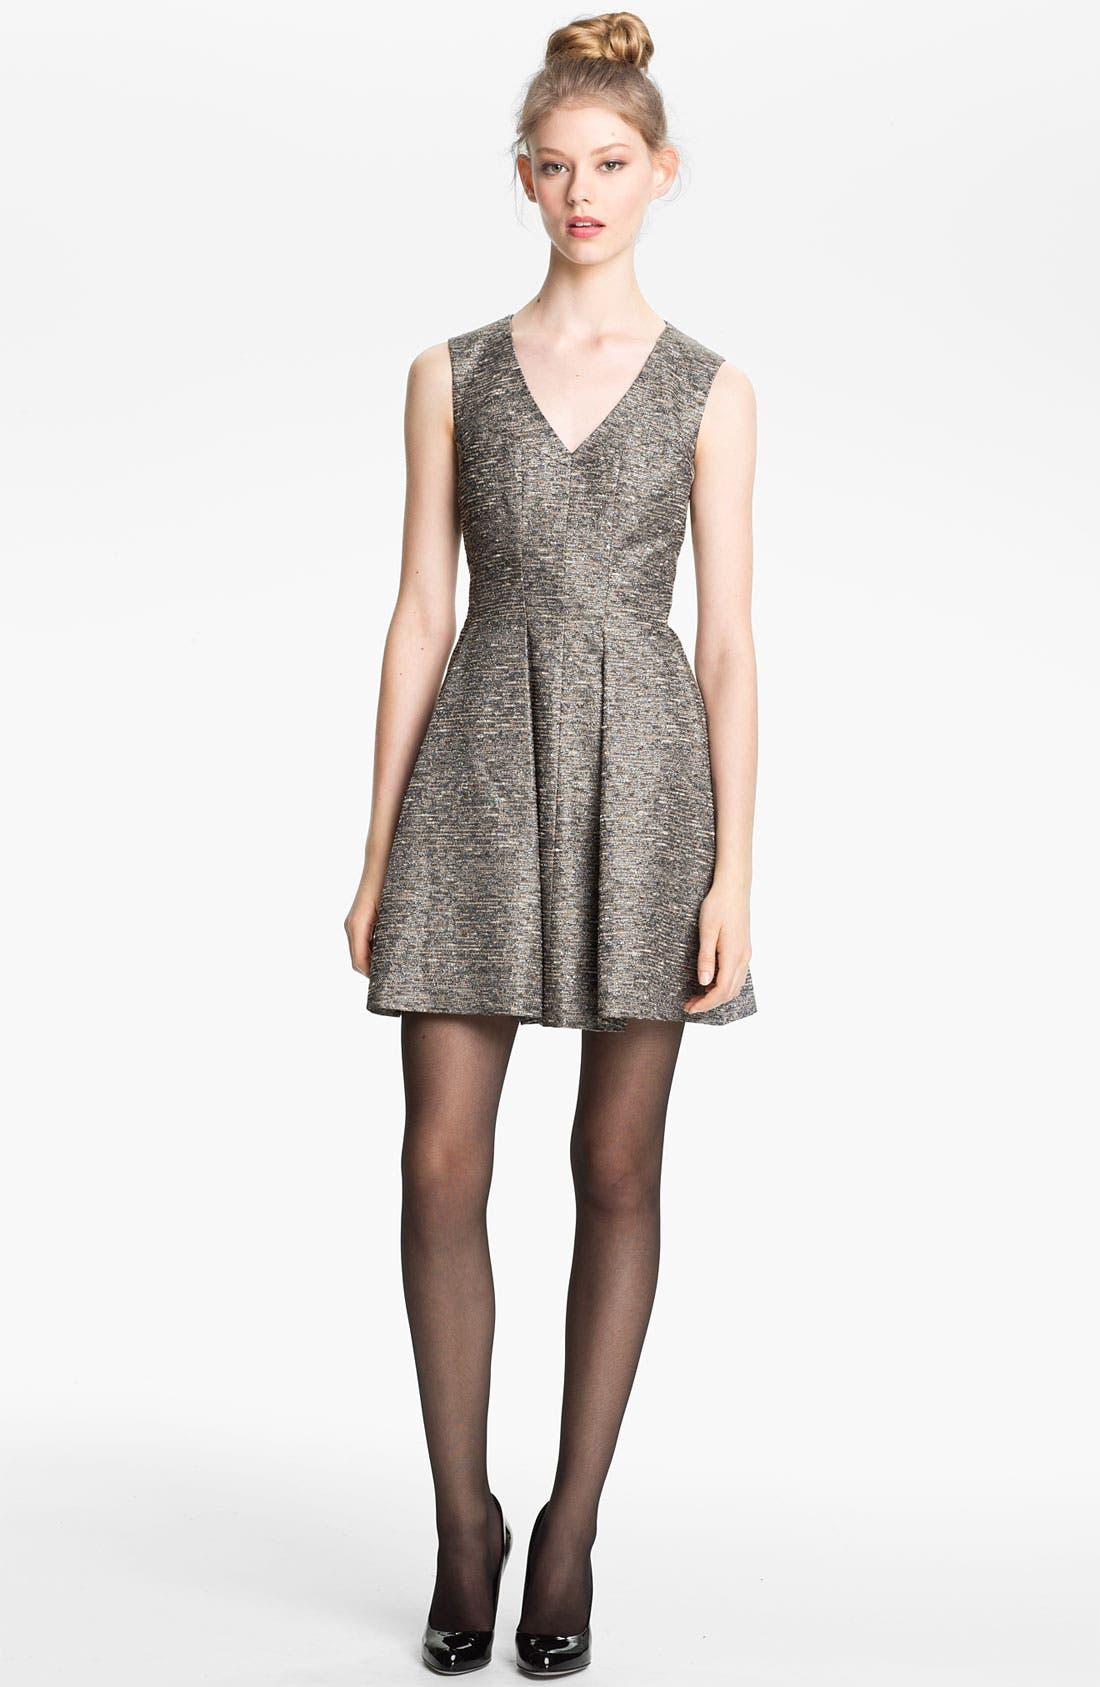 Alternate Image 1 Selected - Mcginn 'Chloe' Textured Metallic Dress